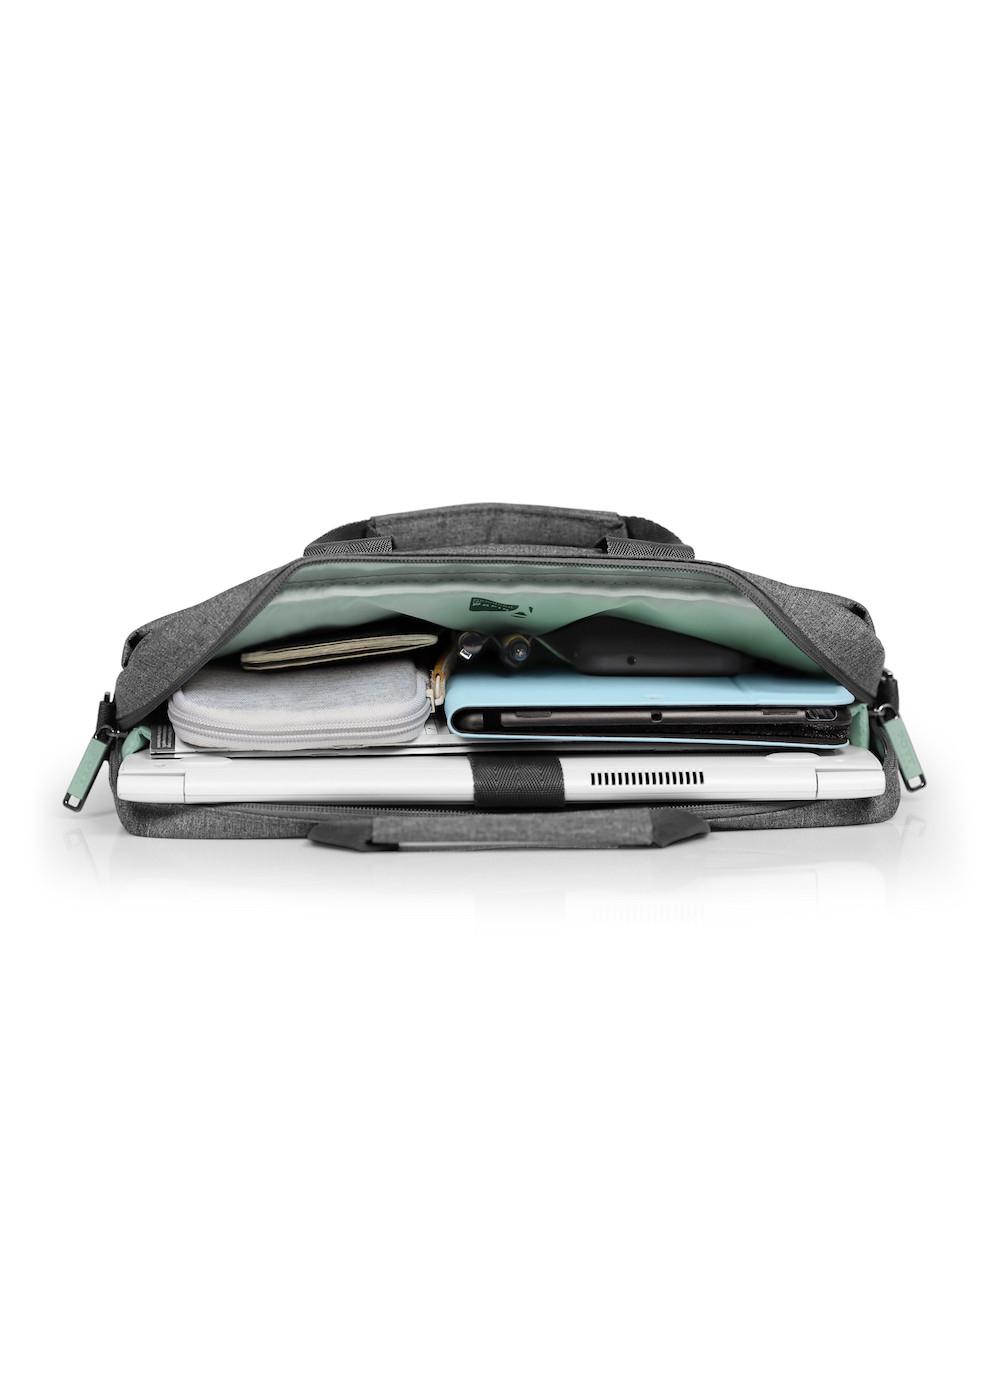 PORT Designs Yosemite Eco TL - Aktenkoffer - 39,6 cm (15.6 Zoll) - Schultergurt - 563 g